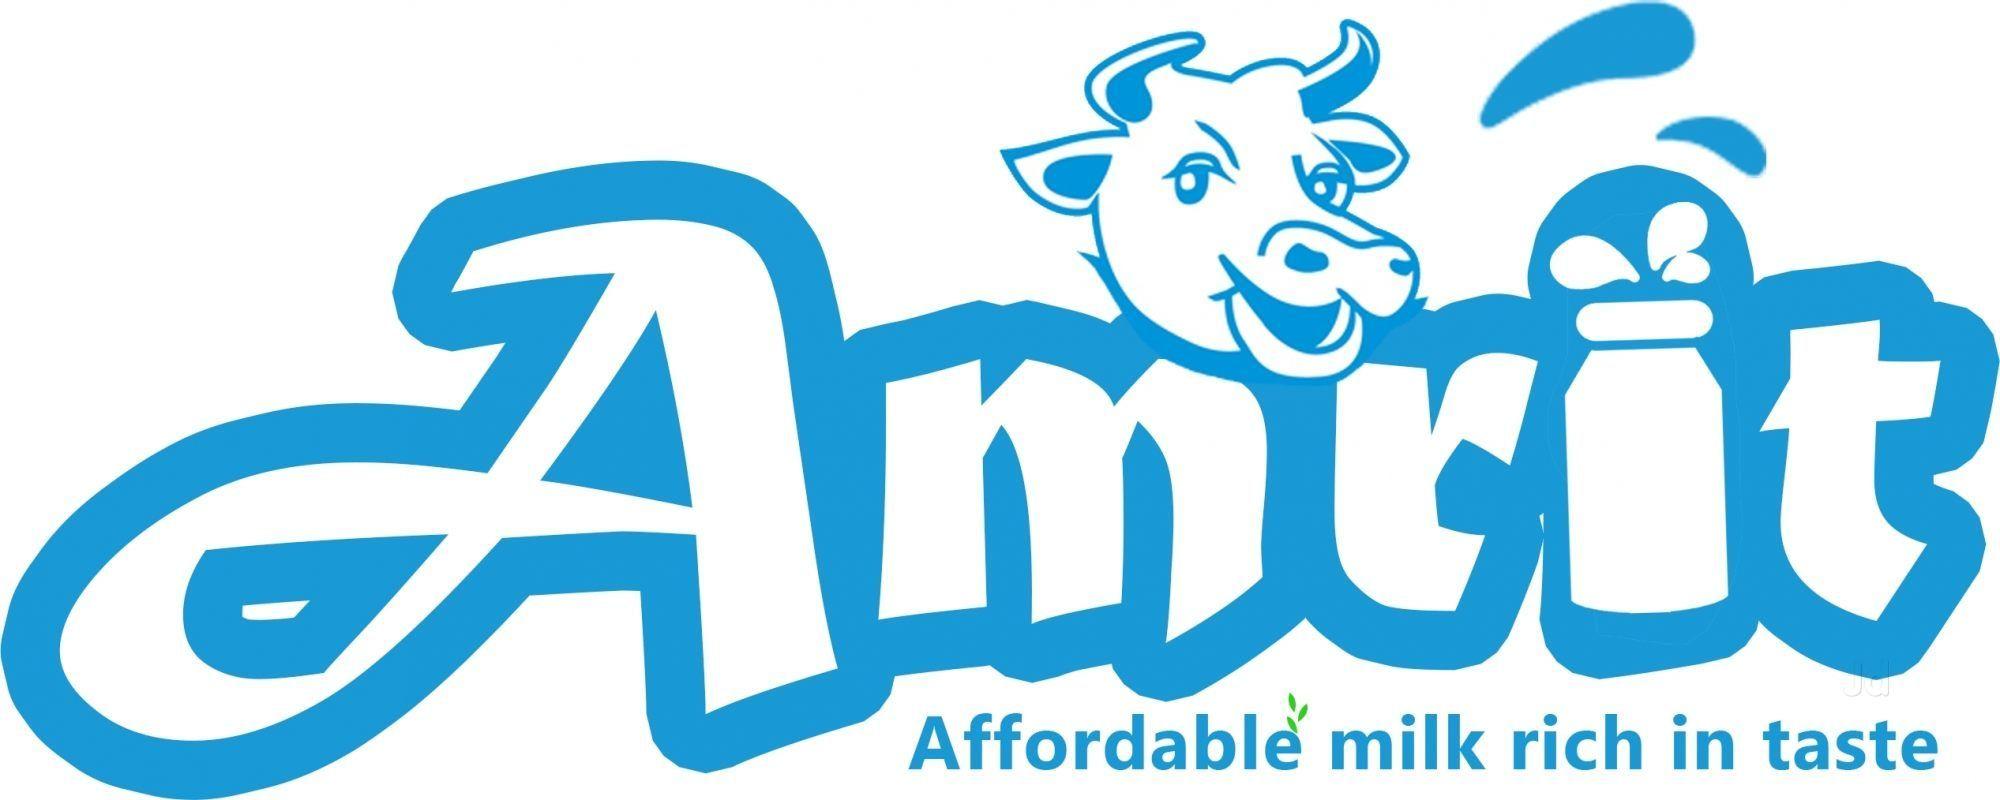 Spam Check Milk companies, Company logo, Business branding